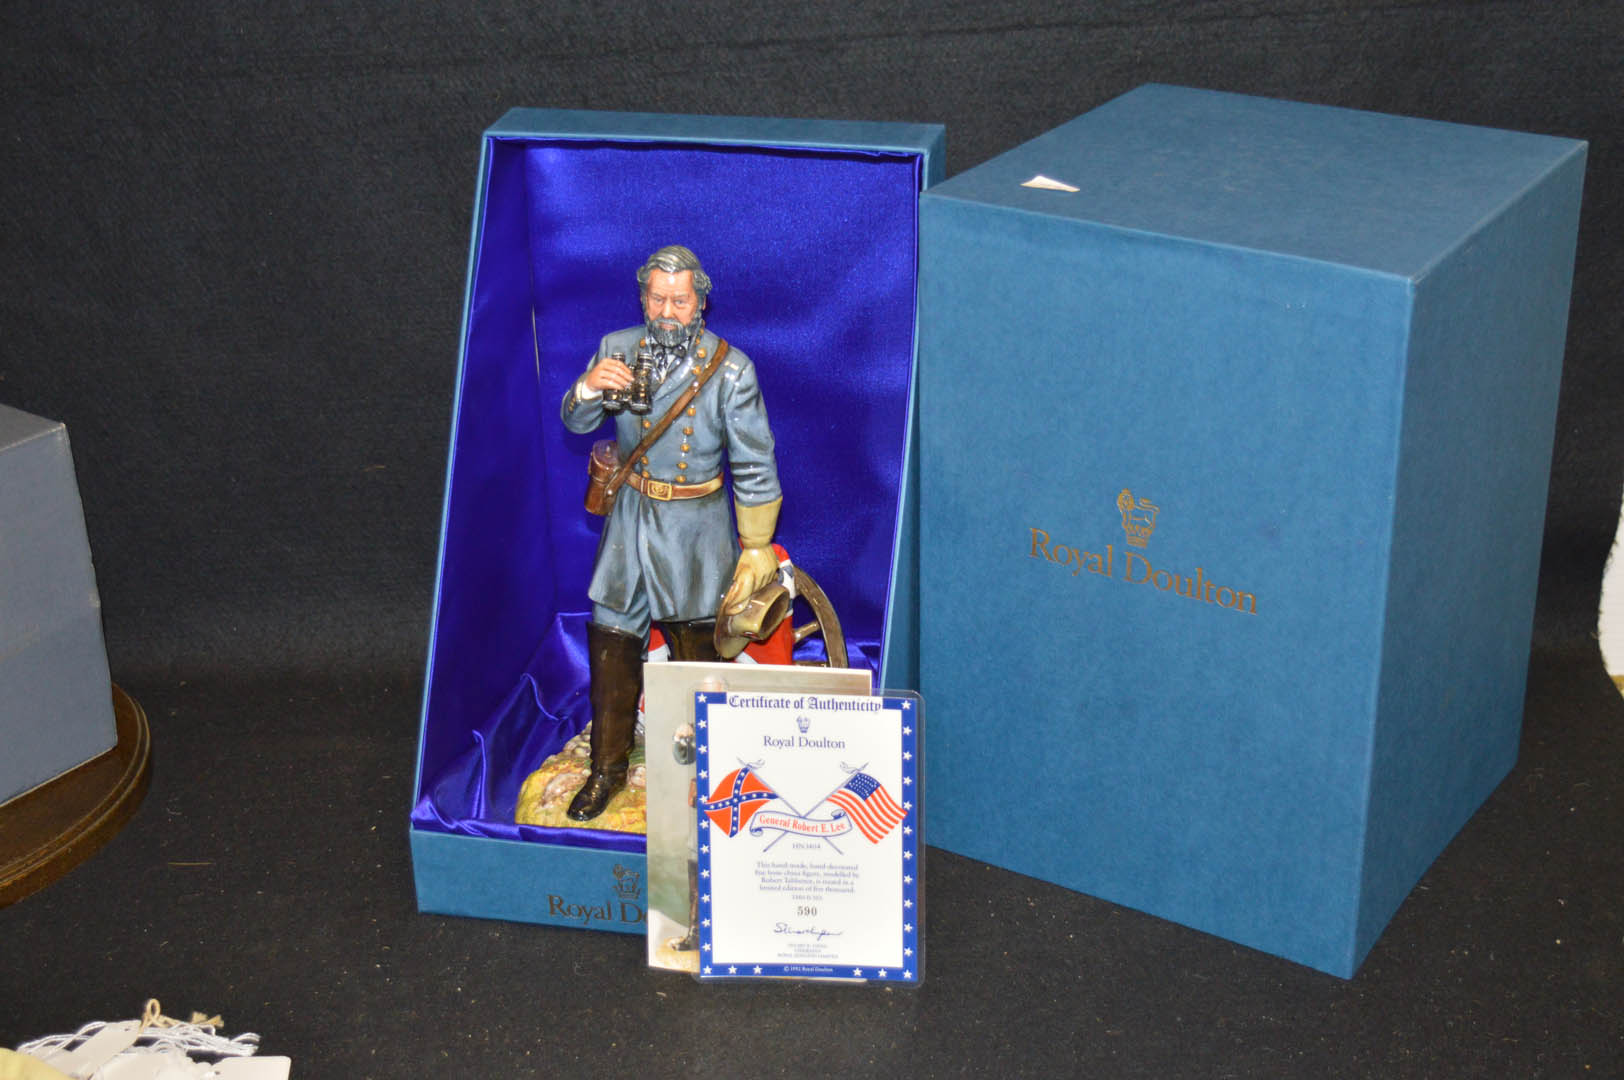 Lot 31 - A Royal Doulton Figurine 'General Robert E Lee'